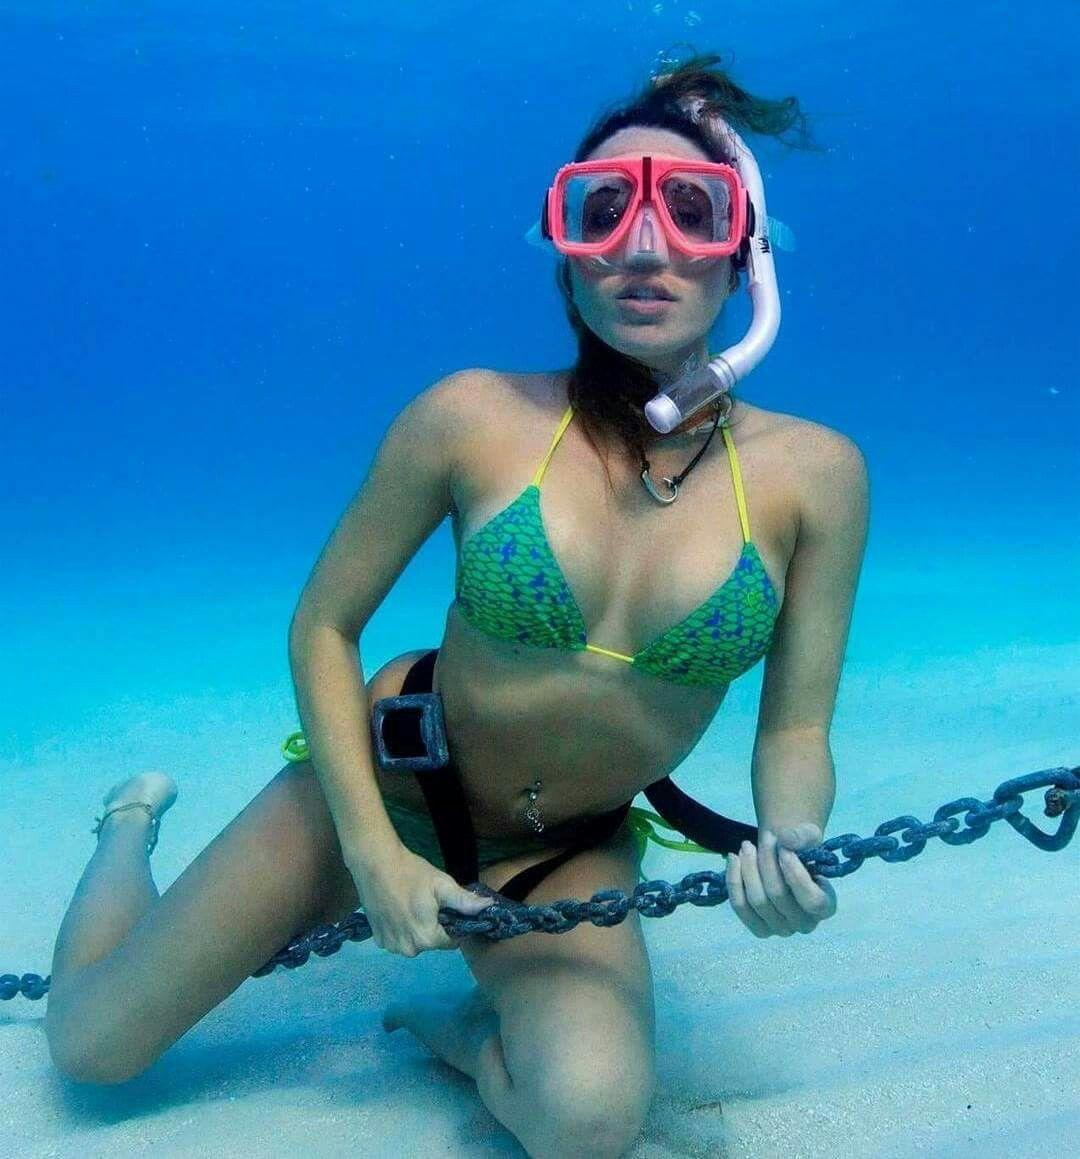 hdtv-bikini-destinations-scuba-flagstaff-lesbian-gay-bisexual